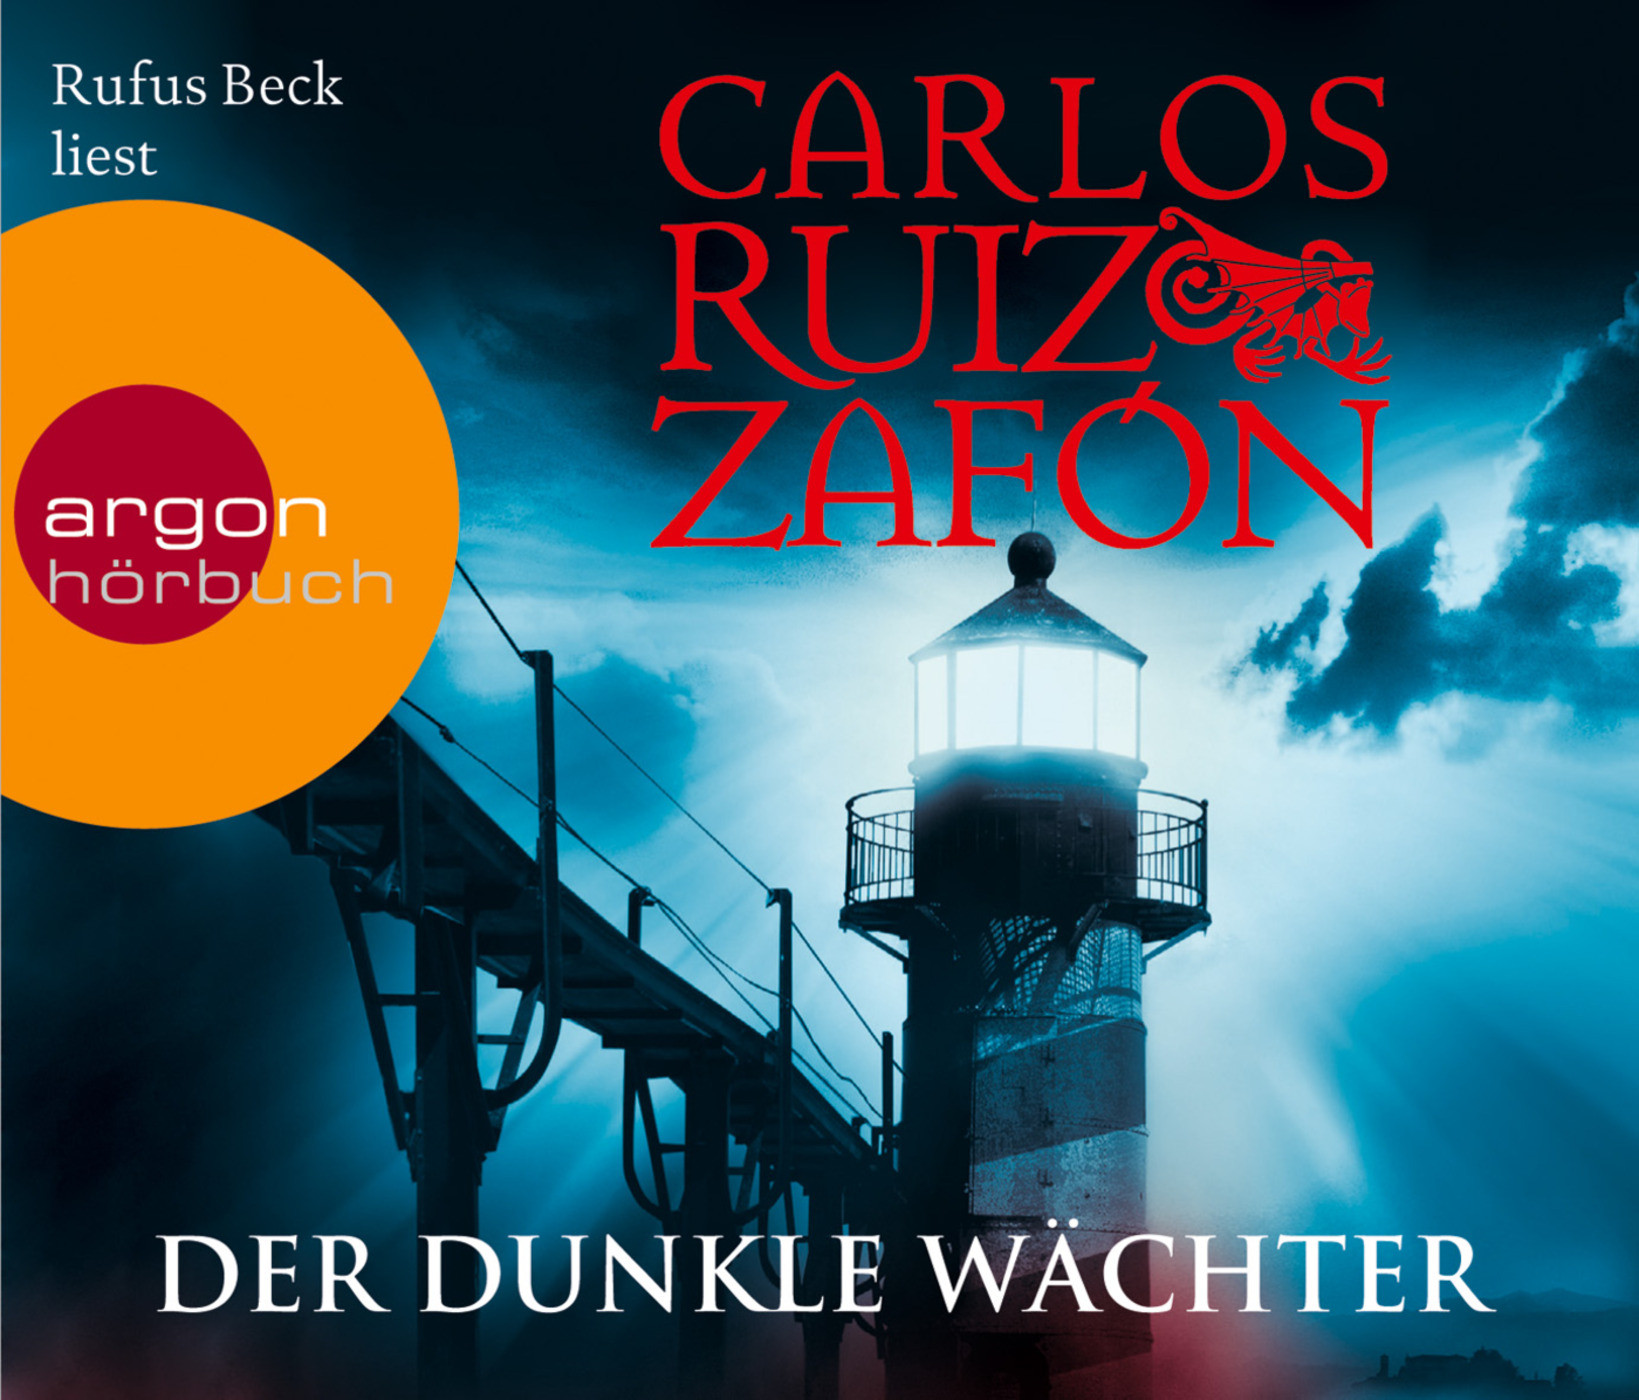 Carlos Ruiz Zafón - Der dunkle Wächter (Hörbestseller)